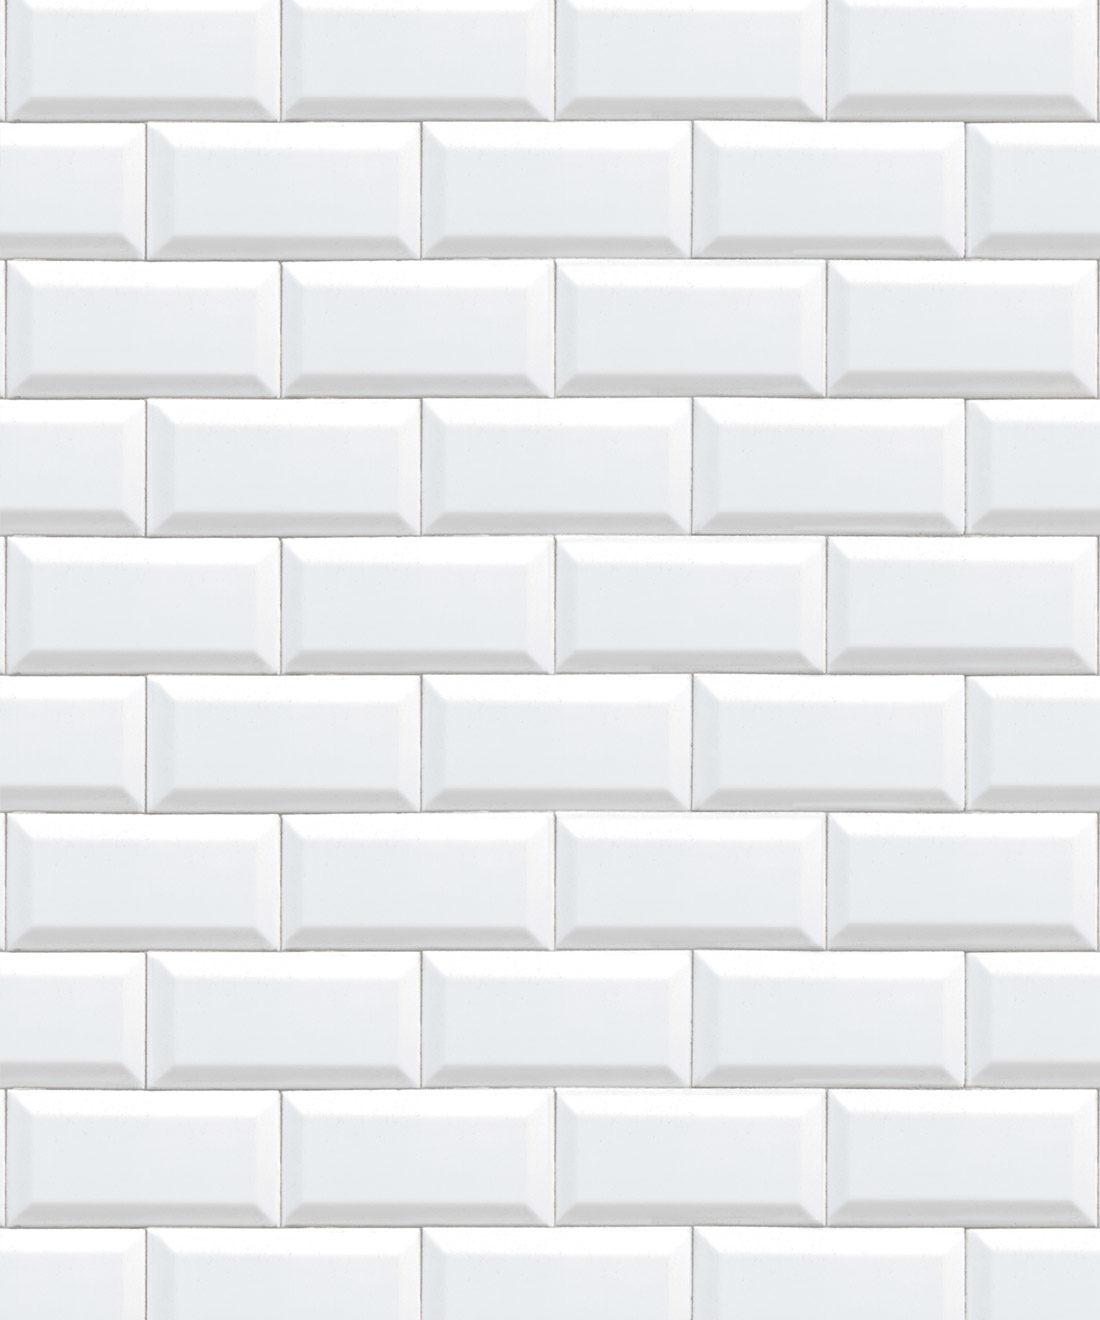 white subway tiles wallpaper minimal wallpaper milton king aus